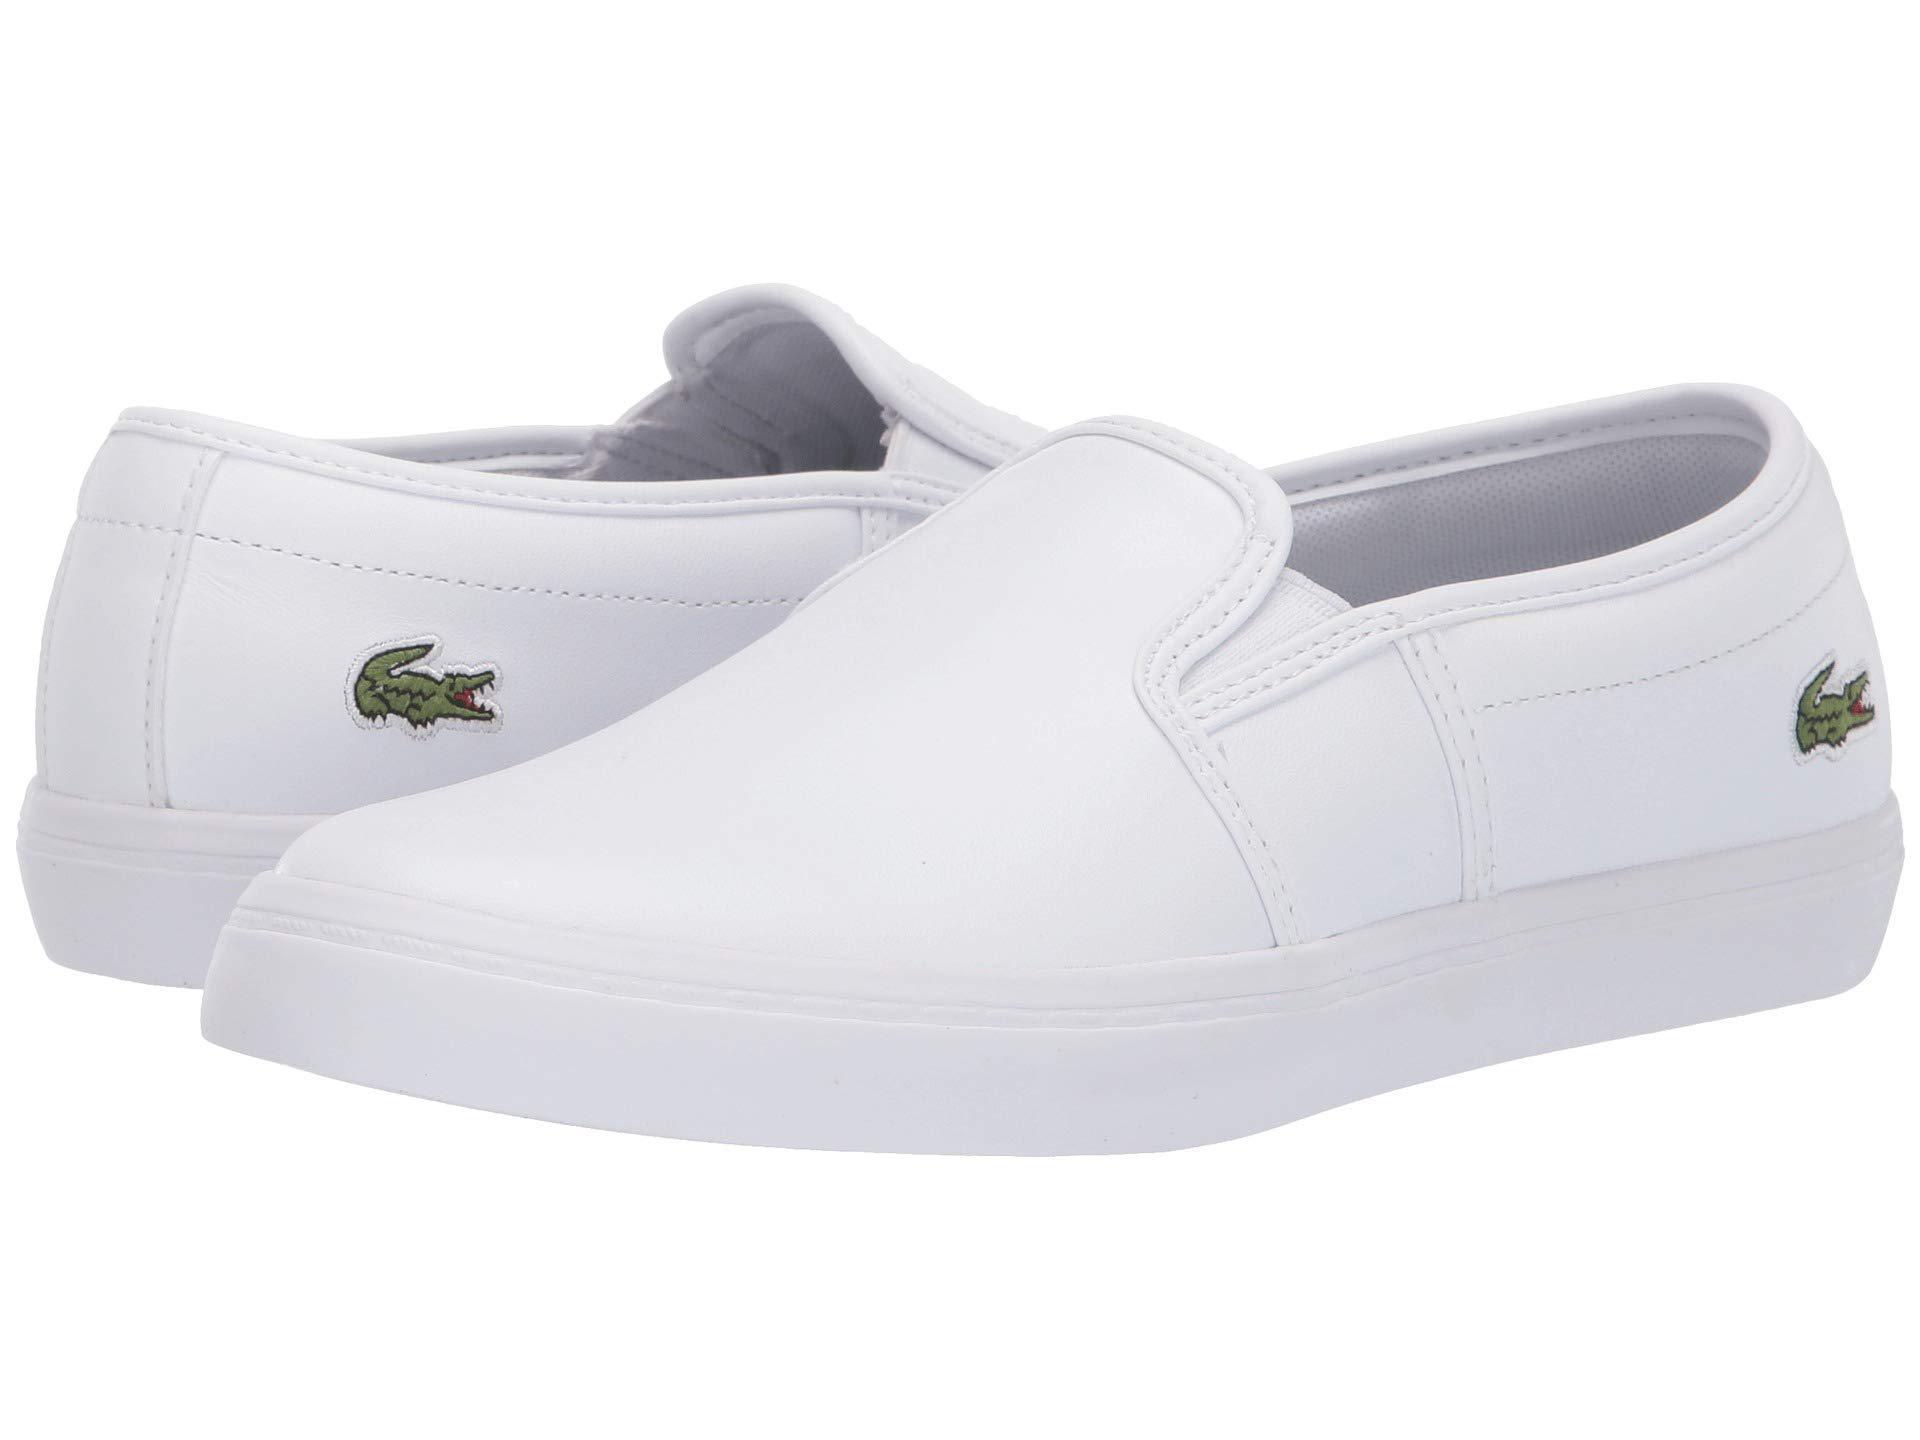 a440bfec9 Lyst - Lacoste Tatalya 119 2 P Cfa in White